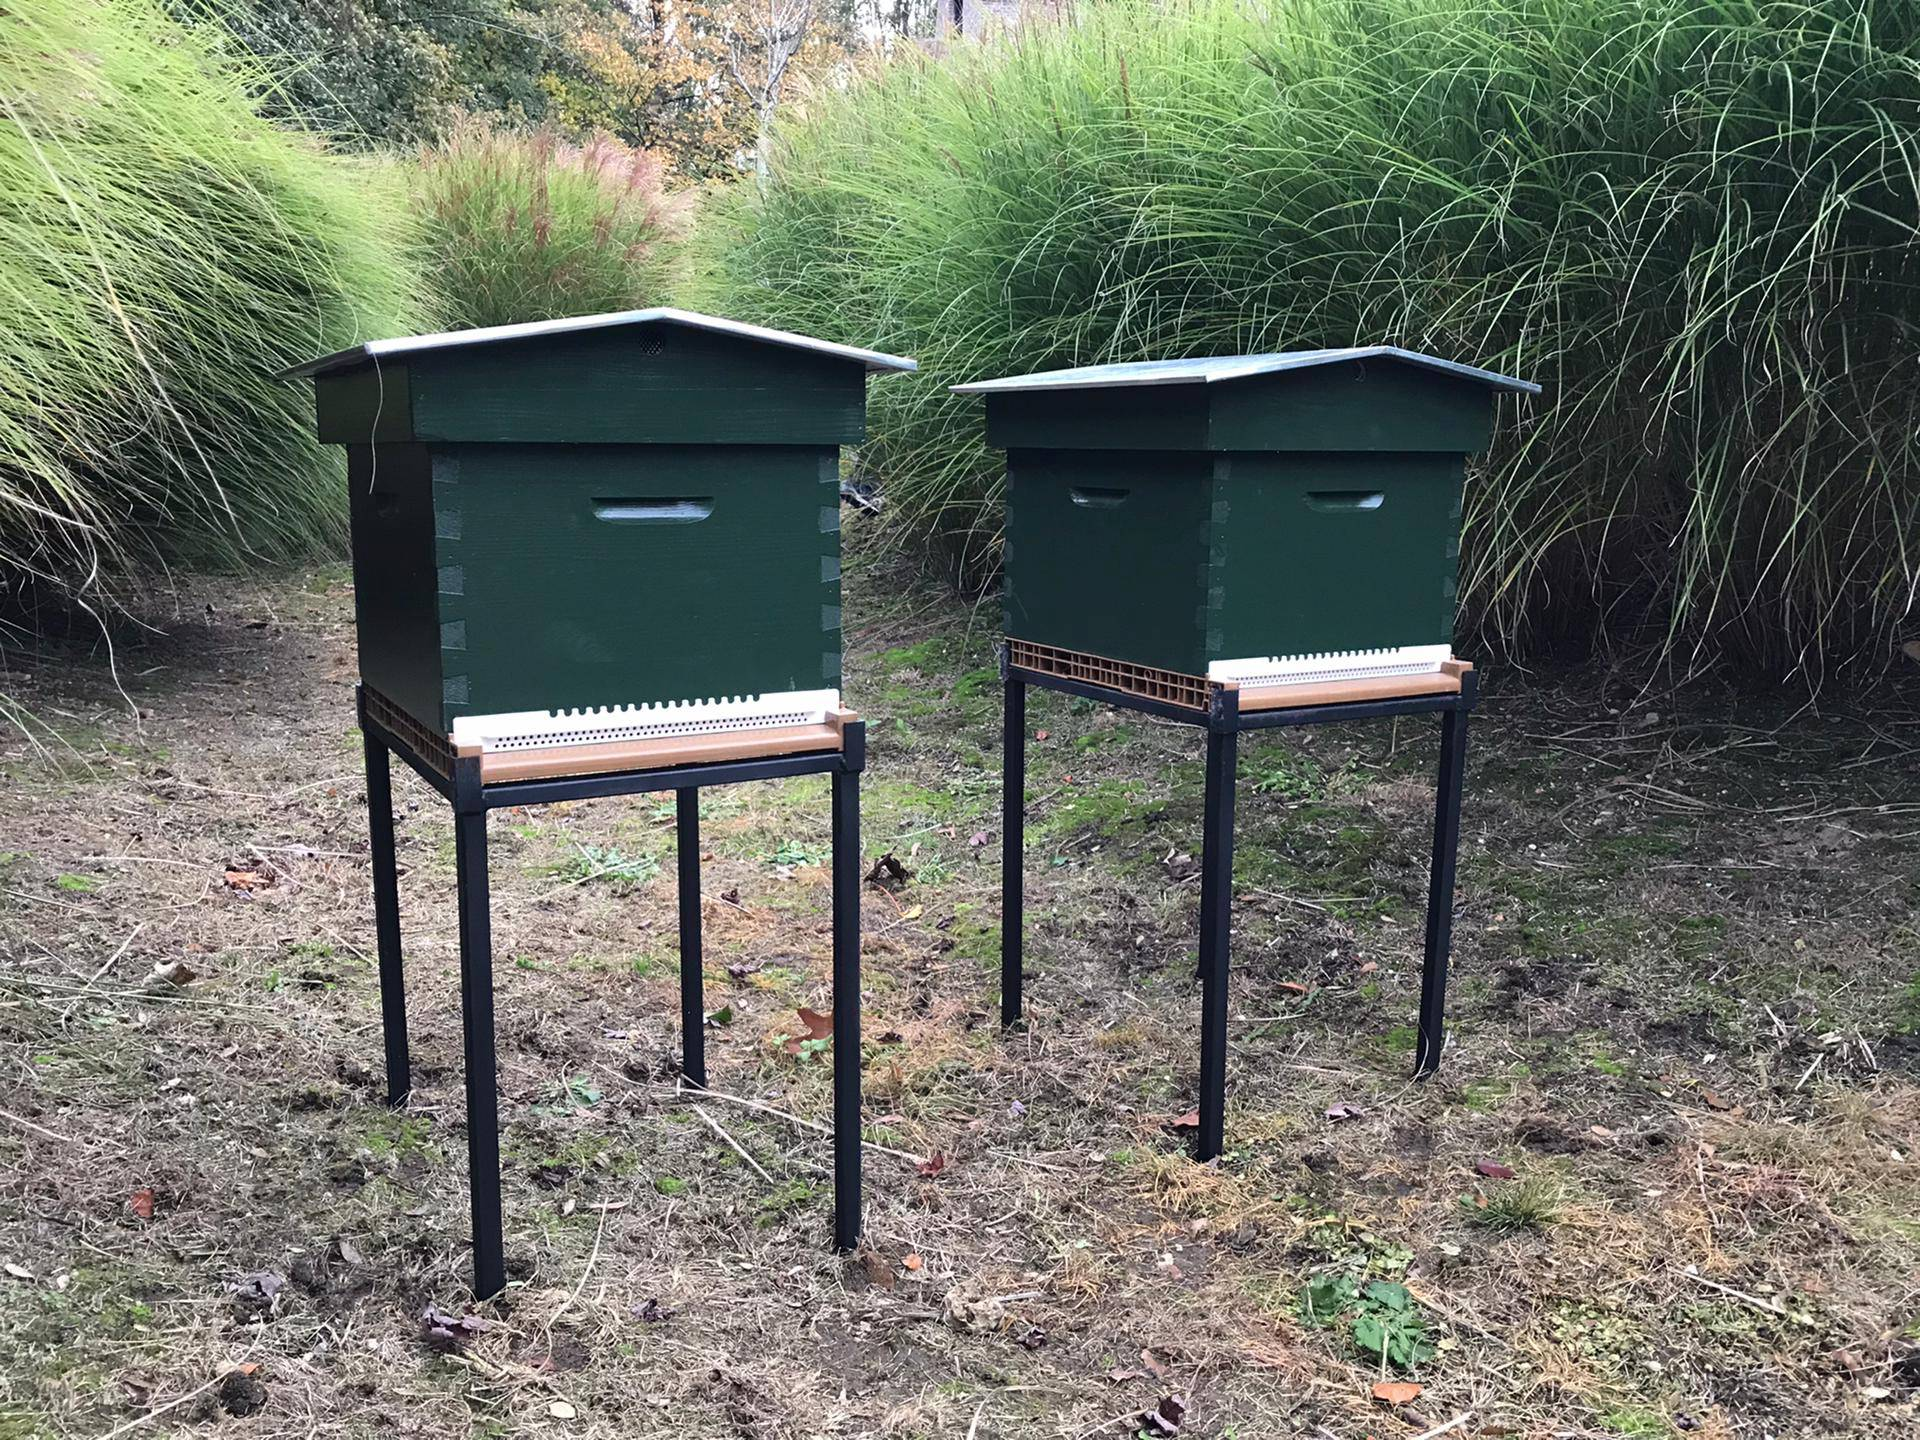 Save Bee - parrainer une ruche